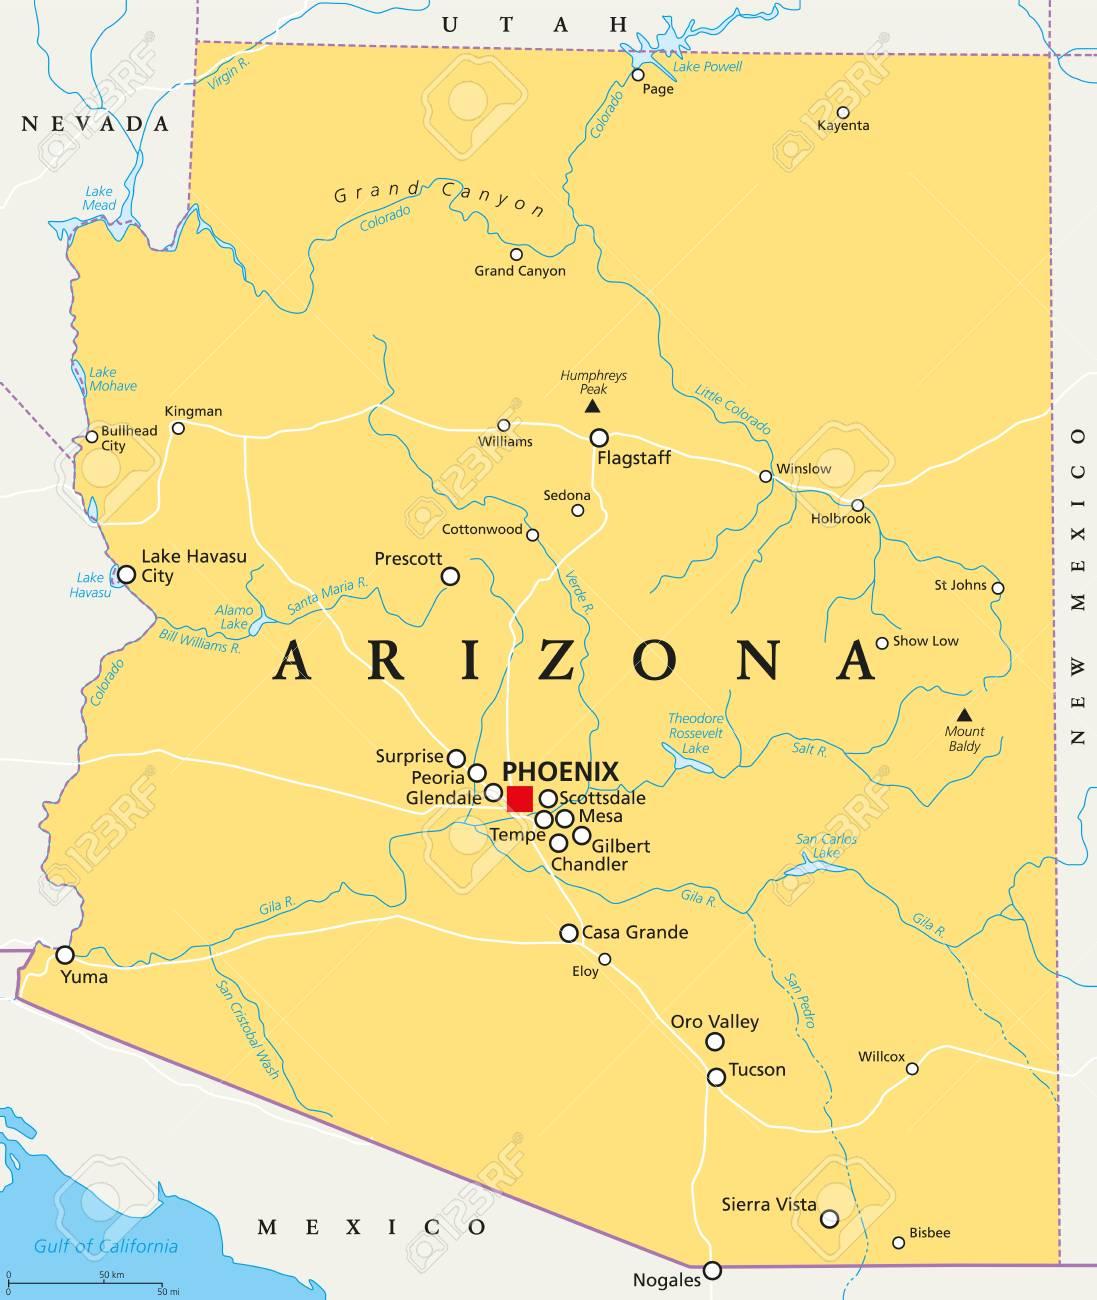 Arizona political map with capital Phoenix, important cities,..